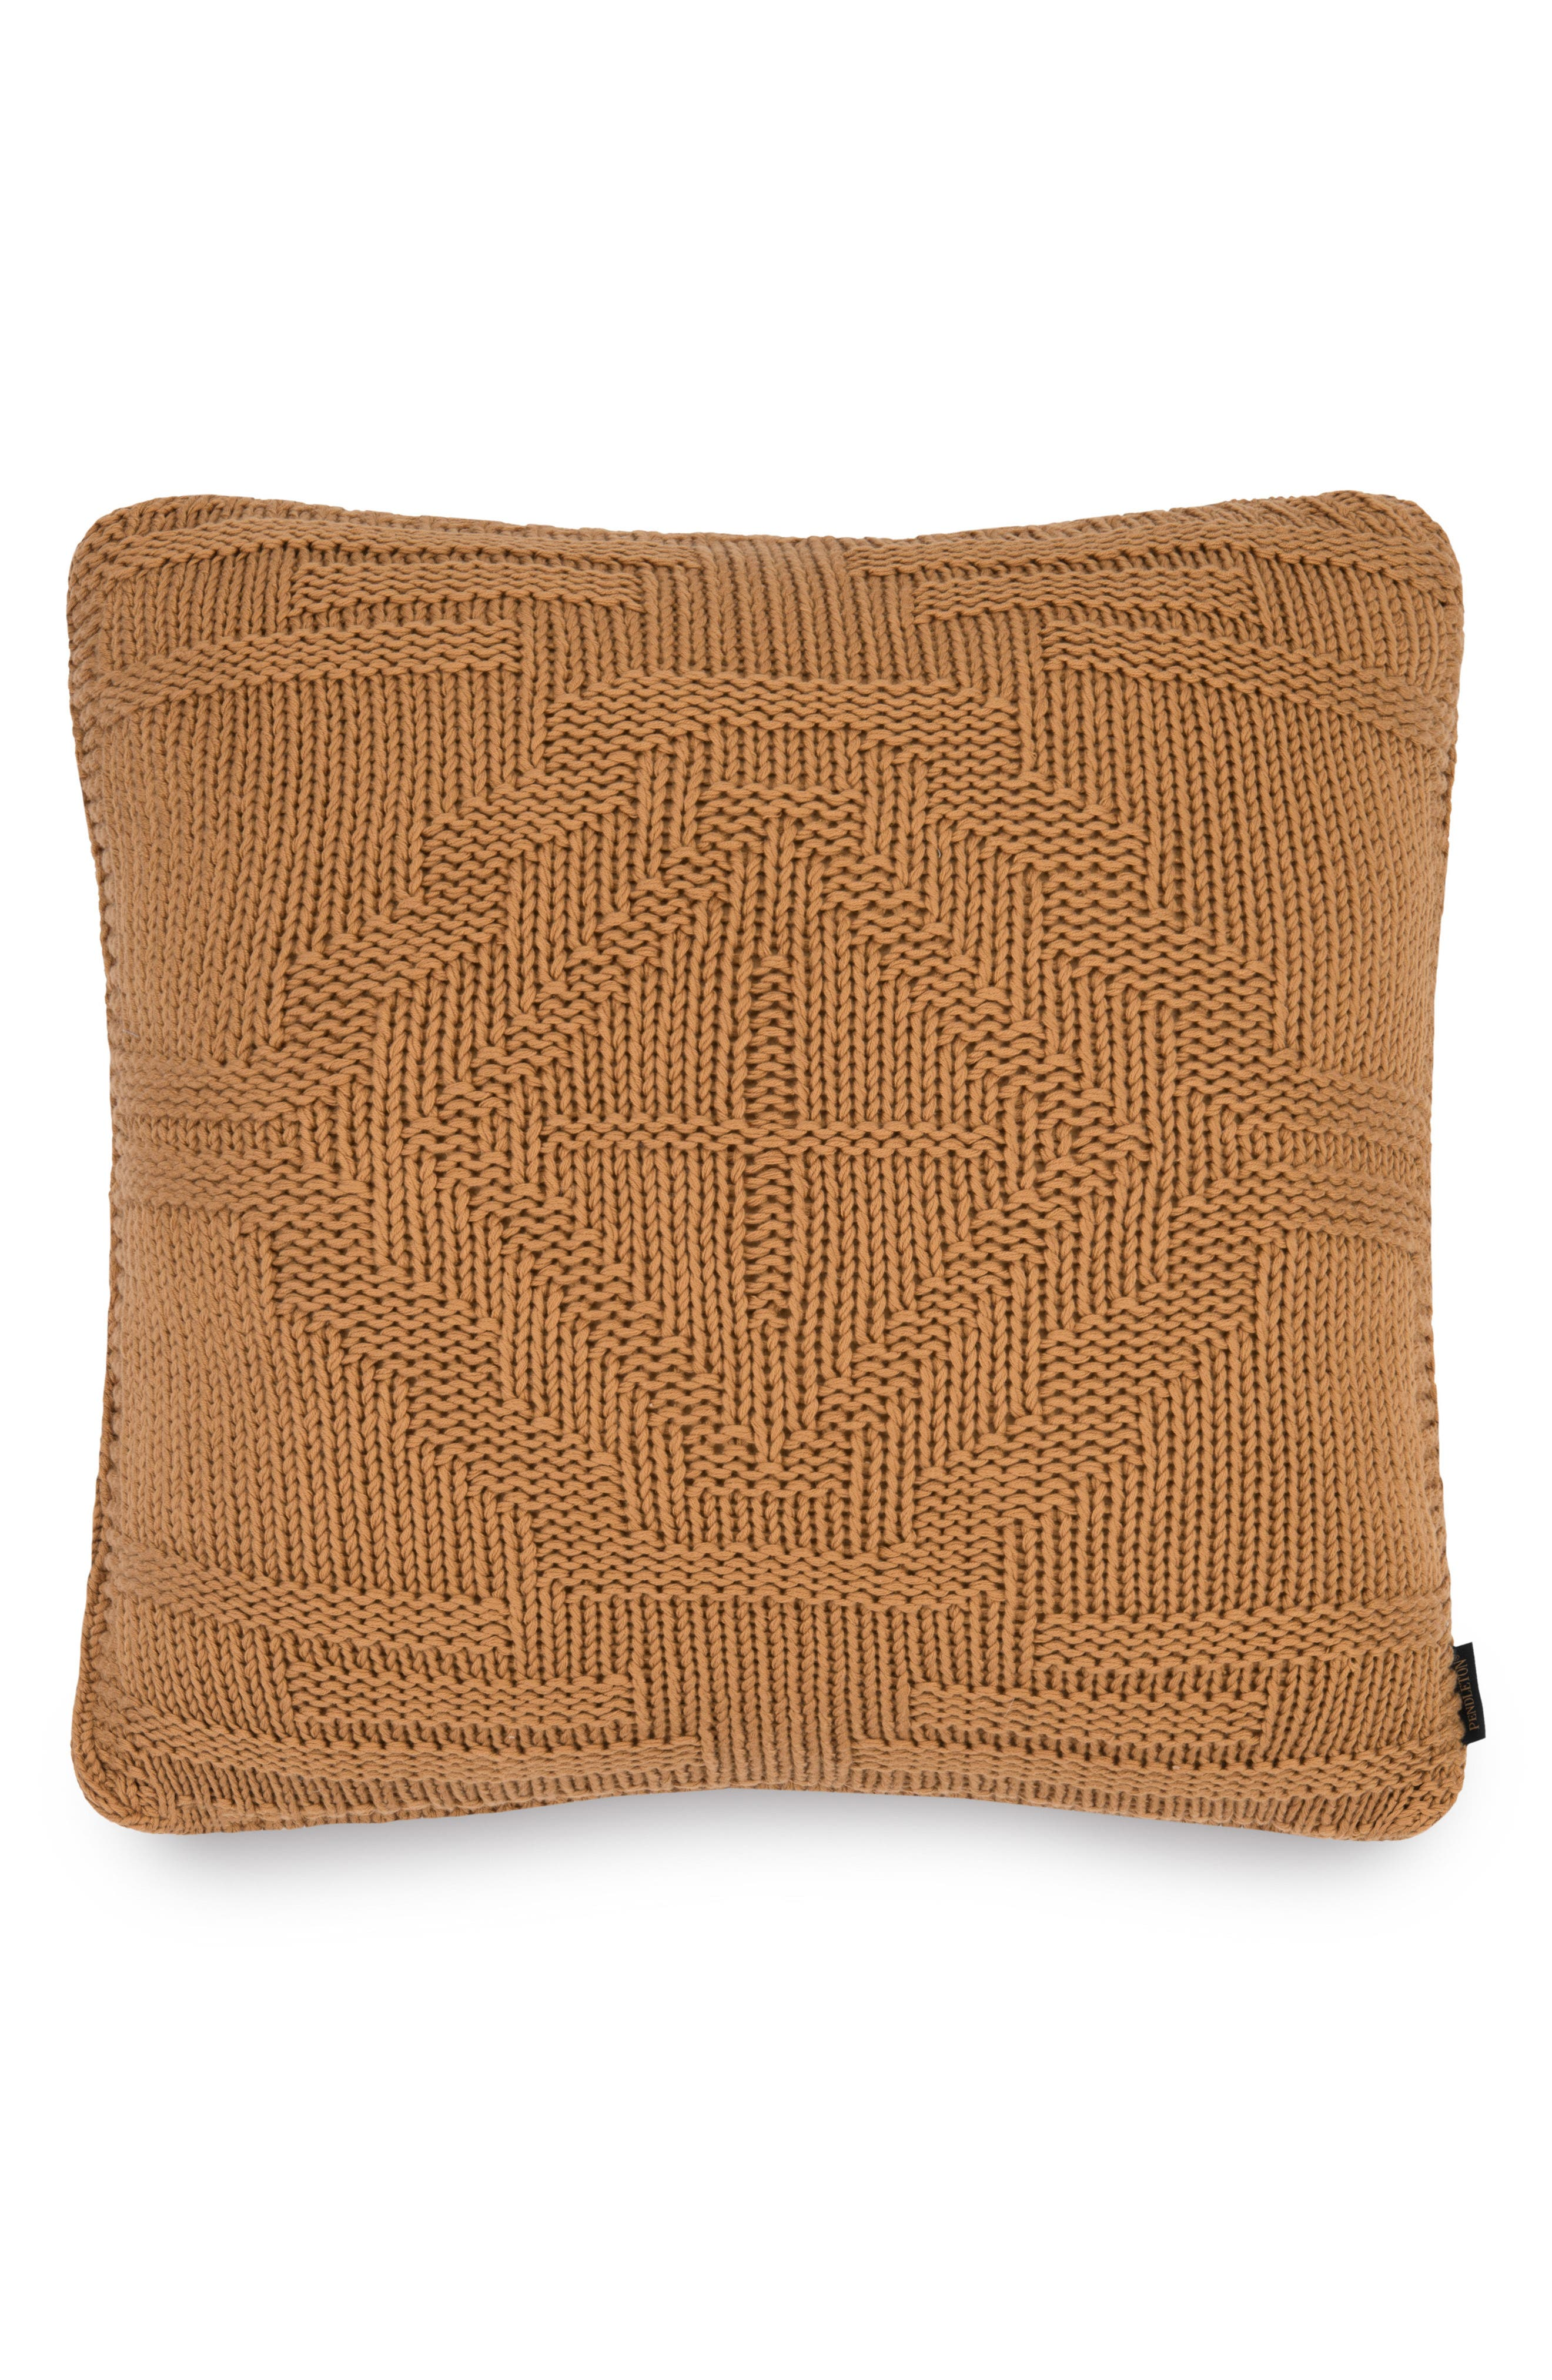 Santa Clara Pillow,                         Main,                         color, Cinnamon